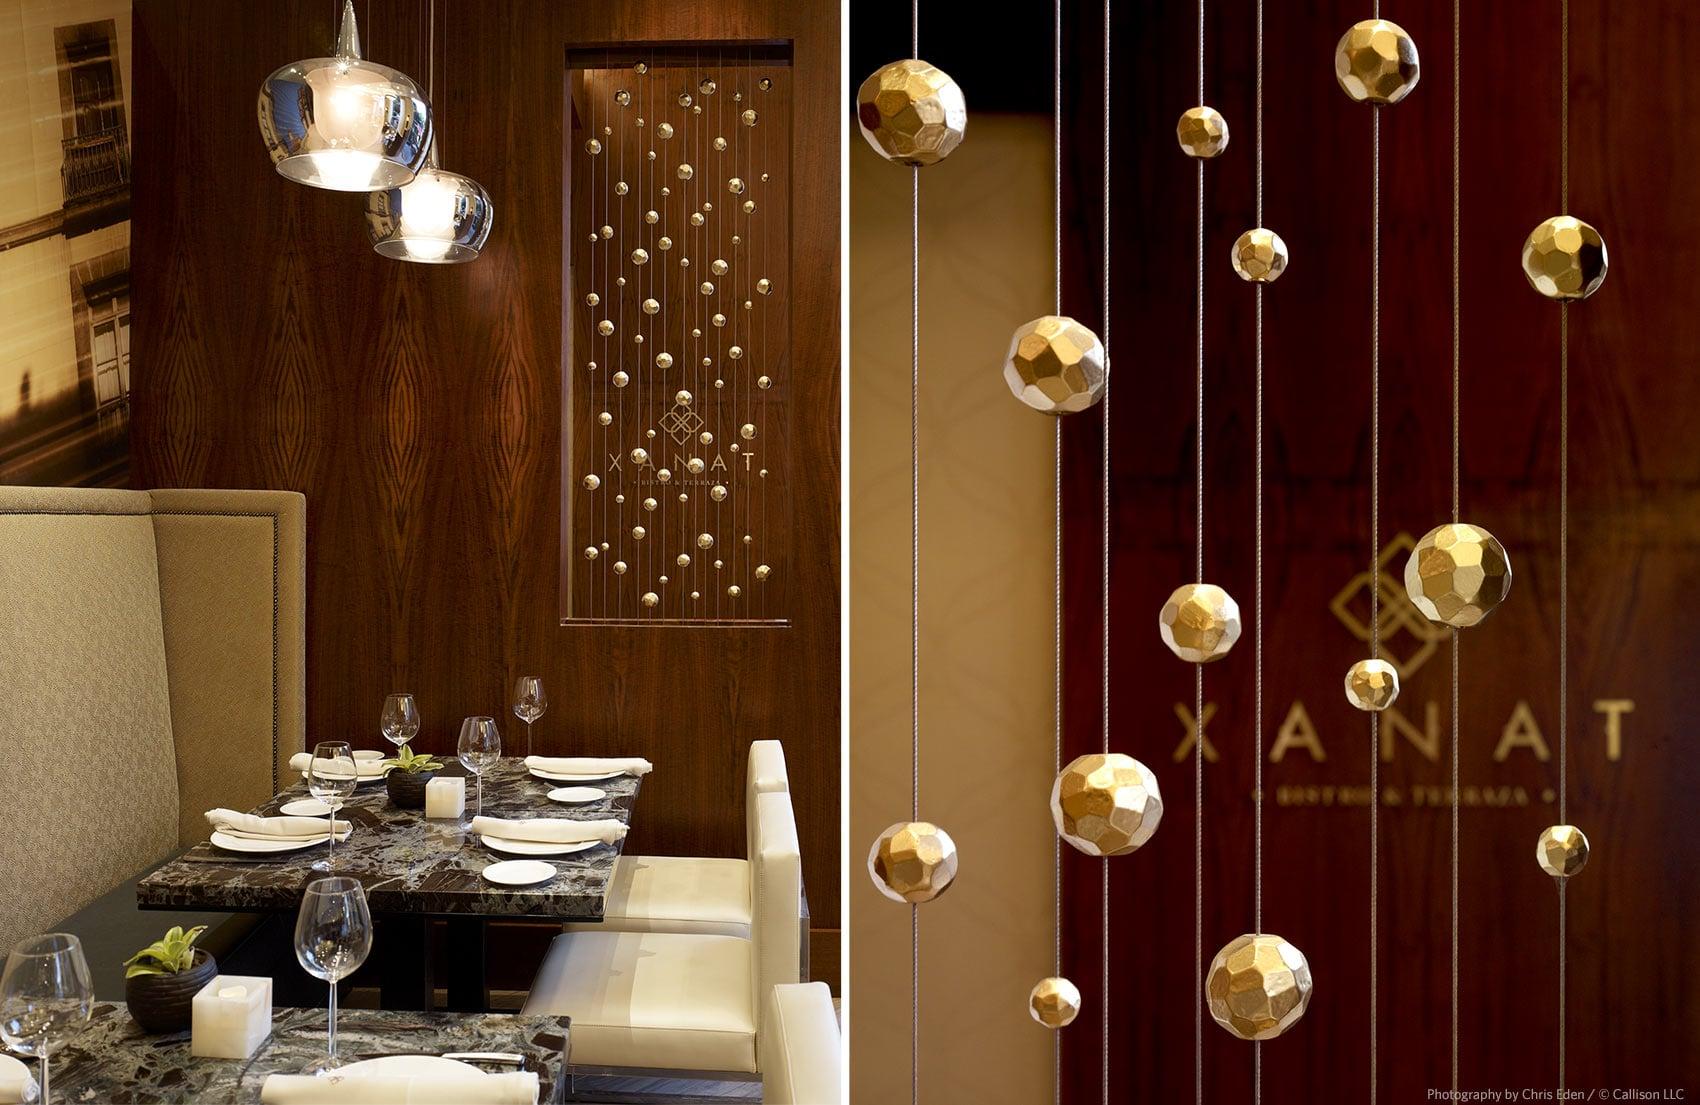 JW Marriott, Mexico City - Hotel restaurant interior - design details